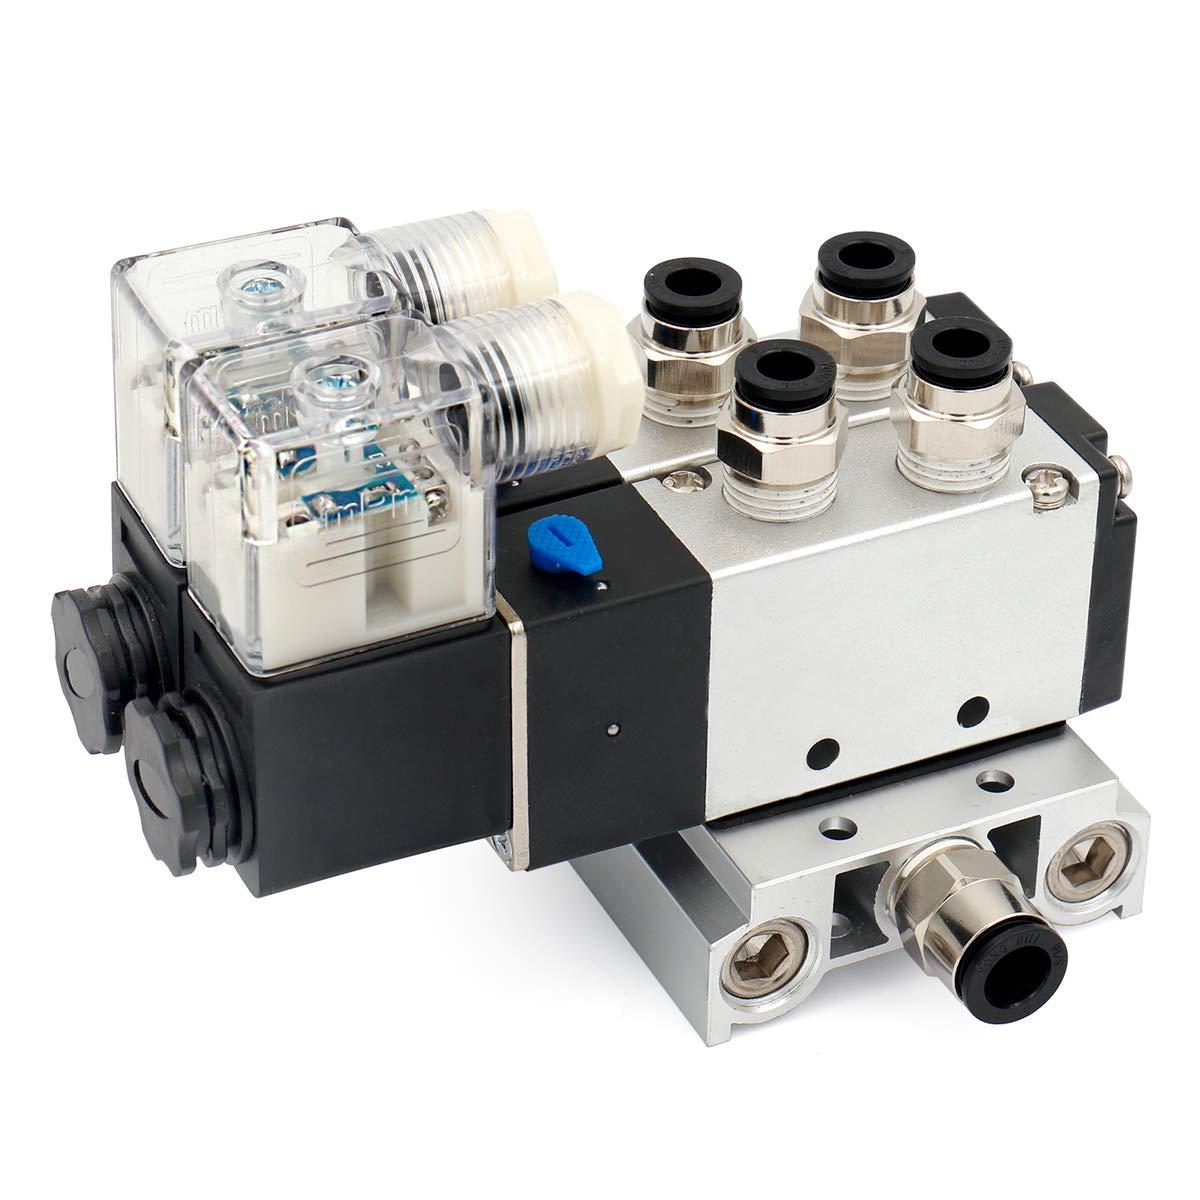 Baomain Pneumatic Solenoid Valve 4V210-08 AC 110V 2 Position 5 Way 2 Connected Base Muffler